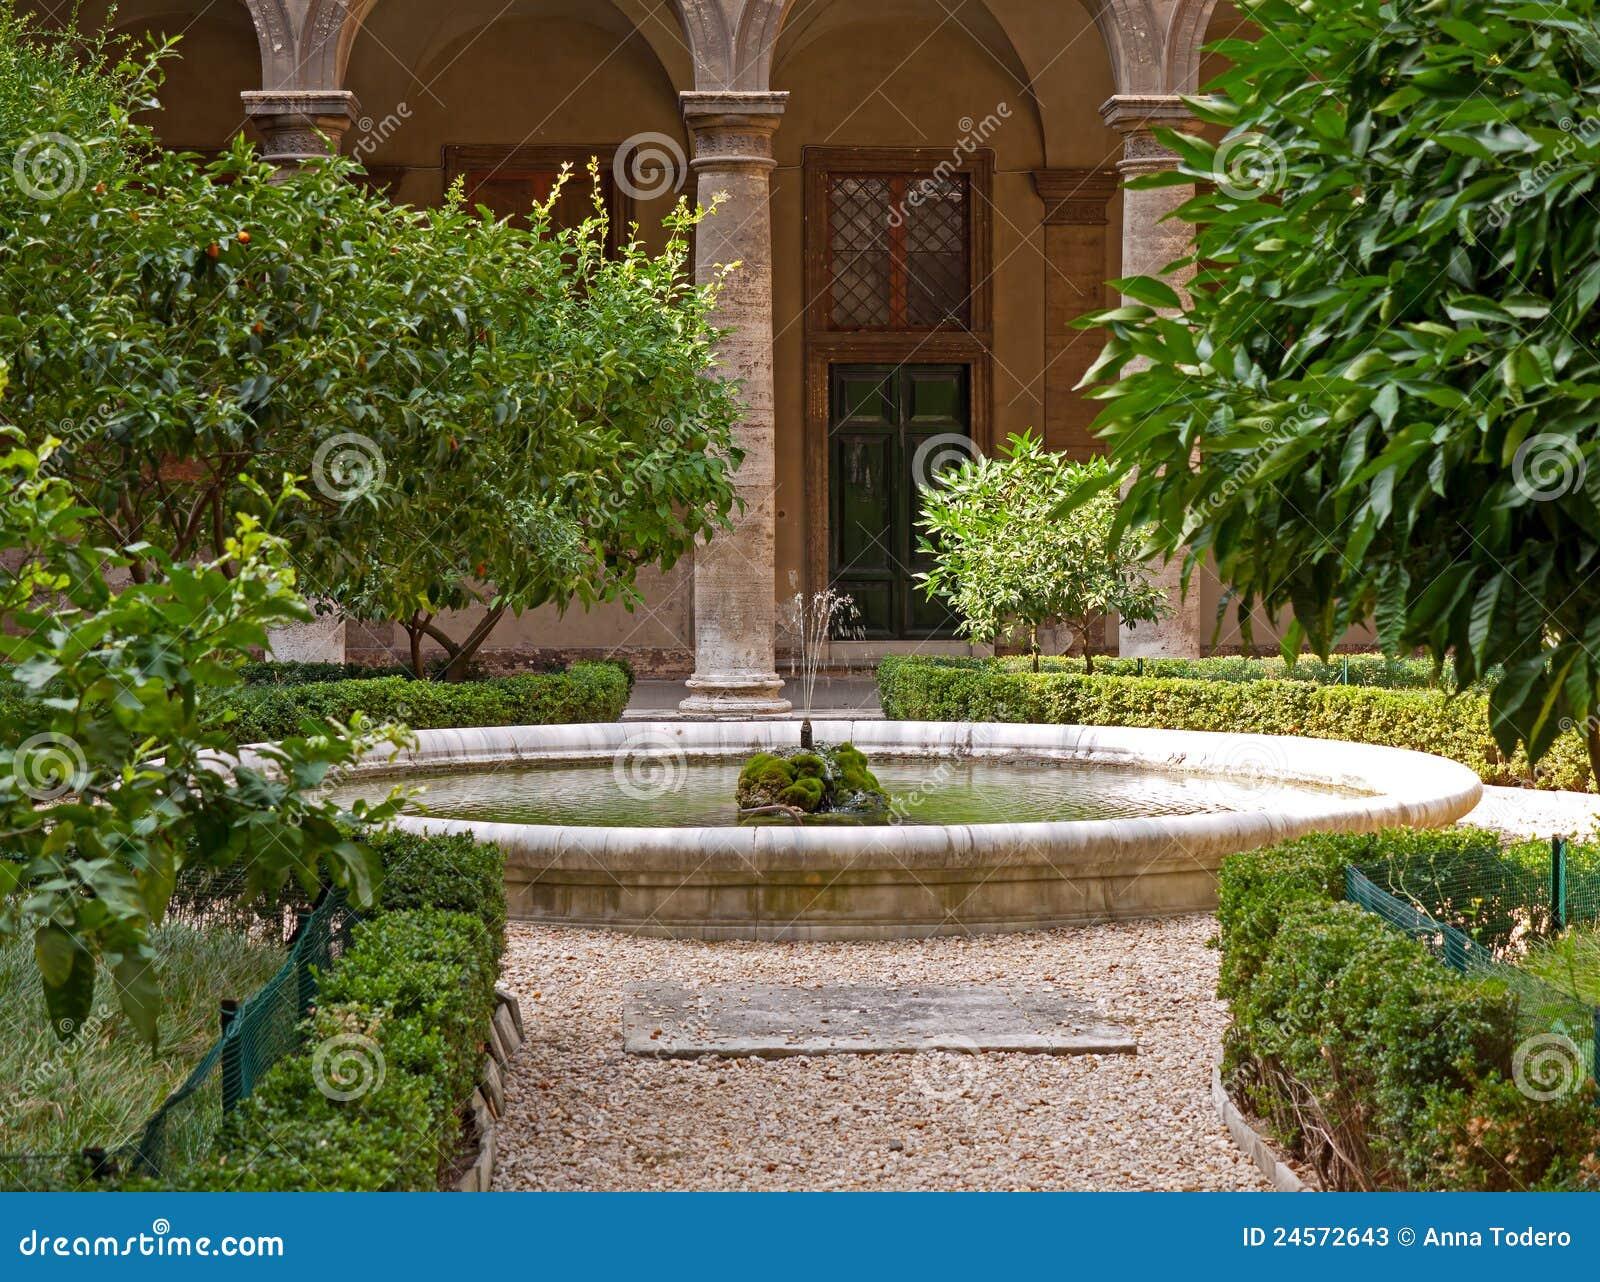 Giardino mediterraneo immagine stock immagine di albero for Giardino mediterraneo